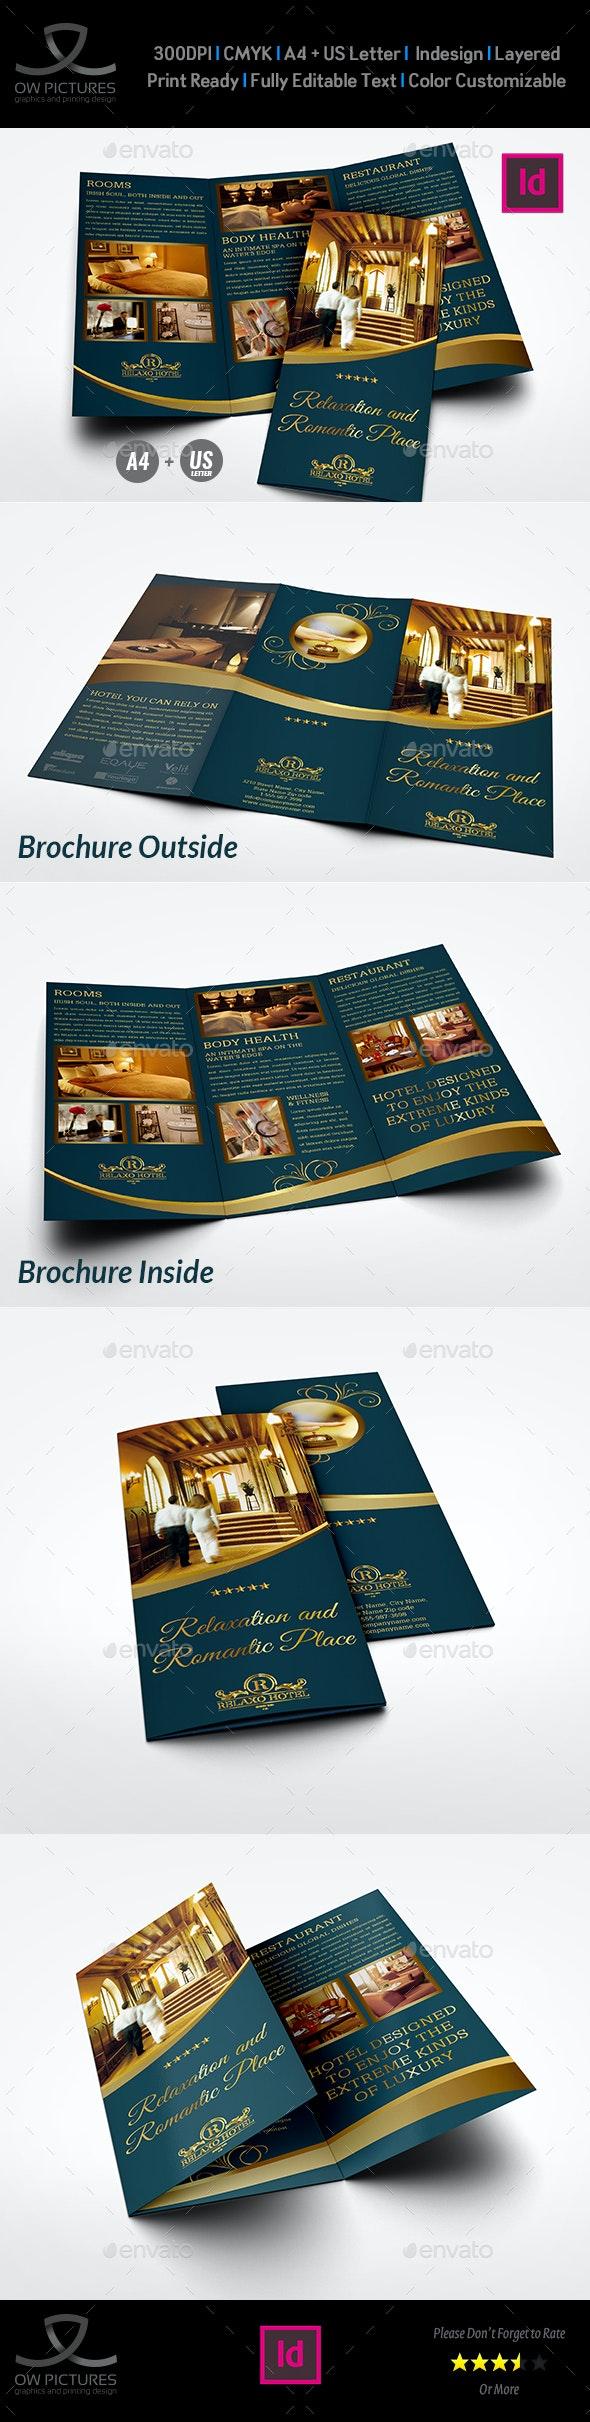 Hotel and Motel Tri-Fold Brochure Template Vol.3 - Brochures Print Templates